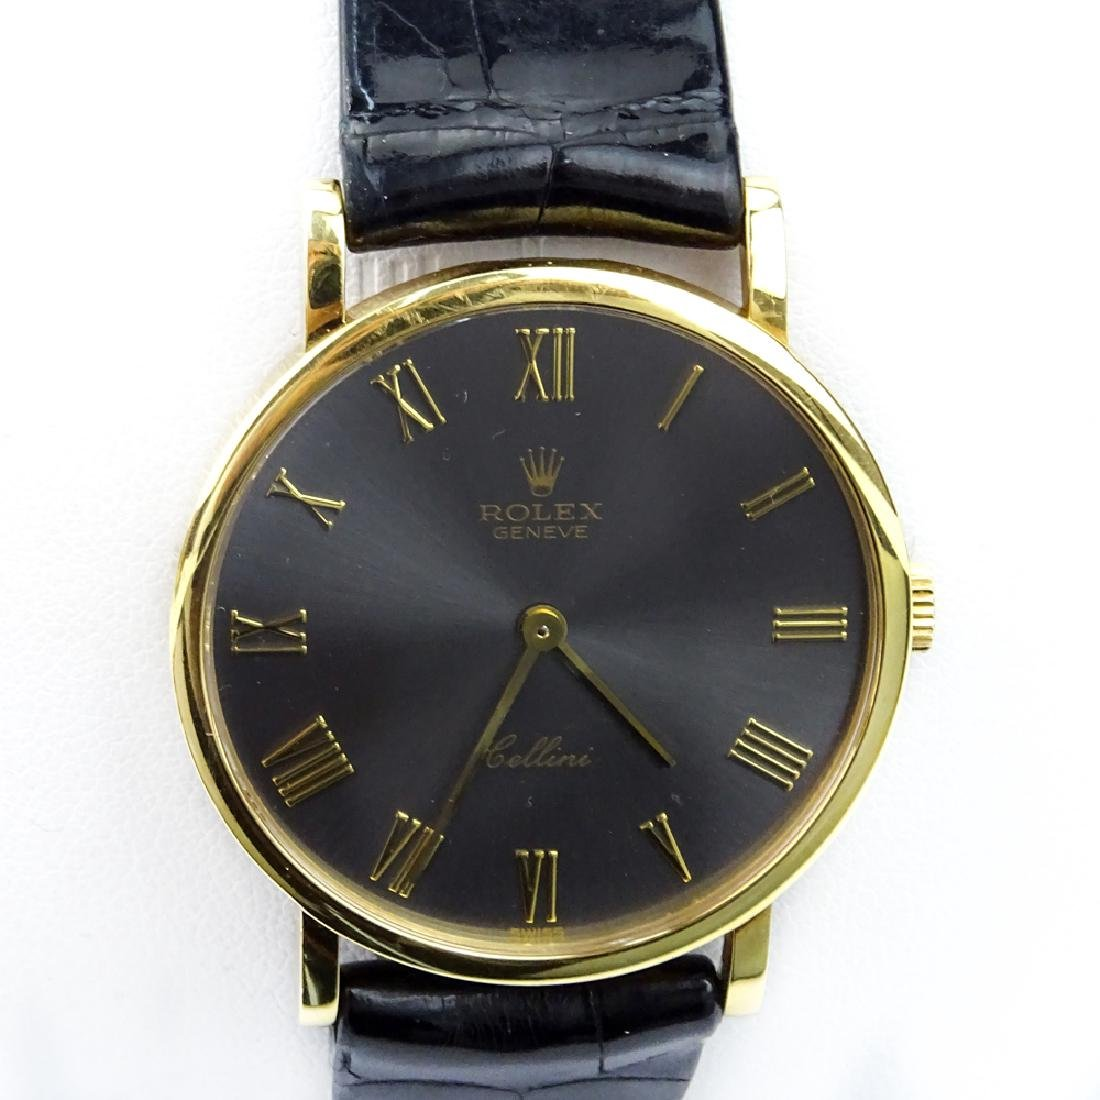 Vintage Rolex Cellini Classic 18 Karat Yellow Gold